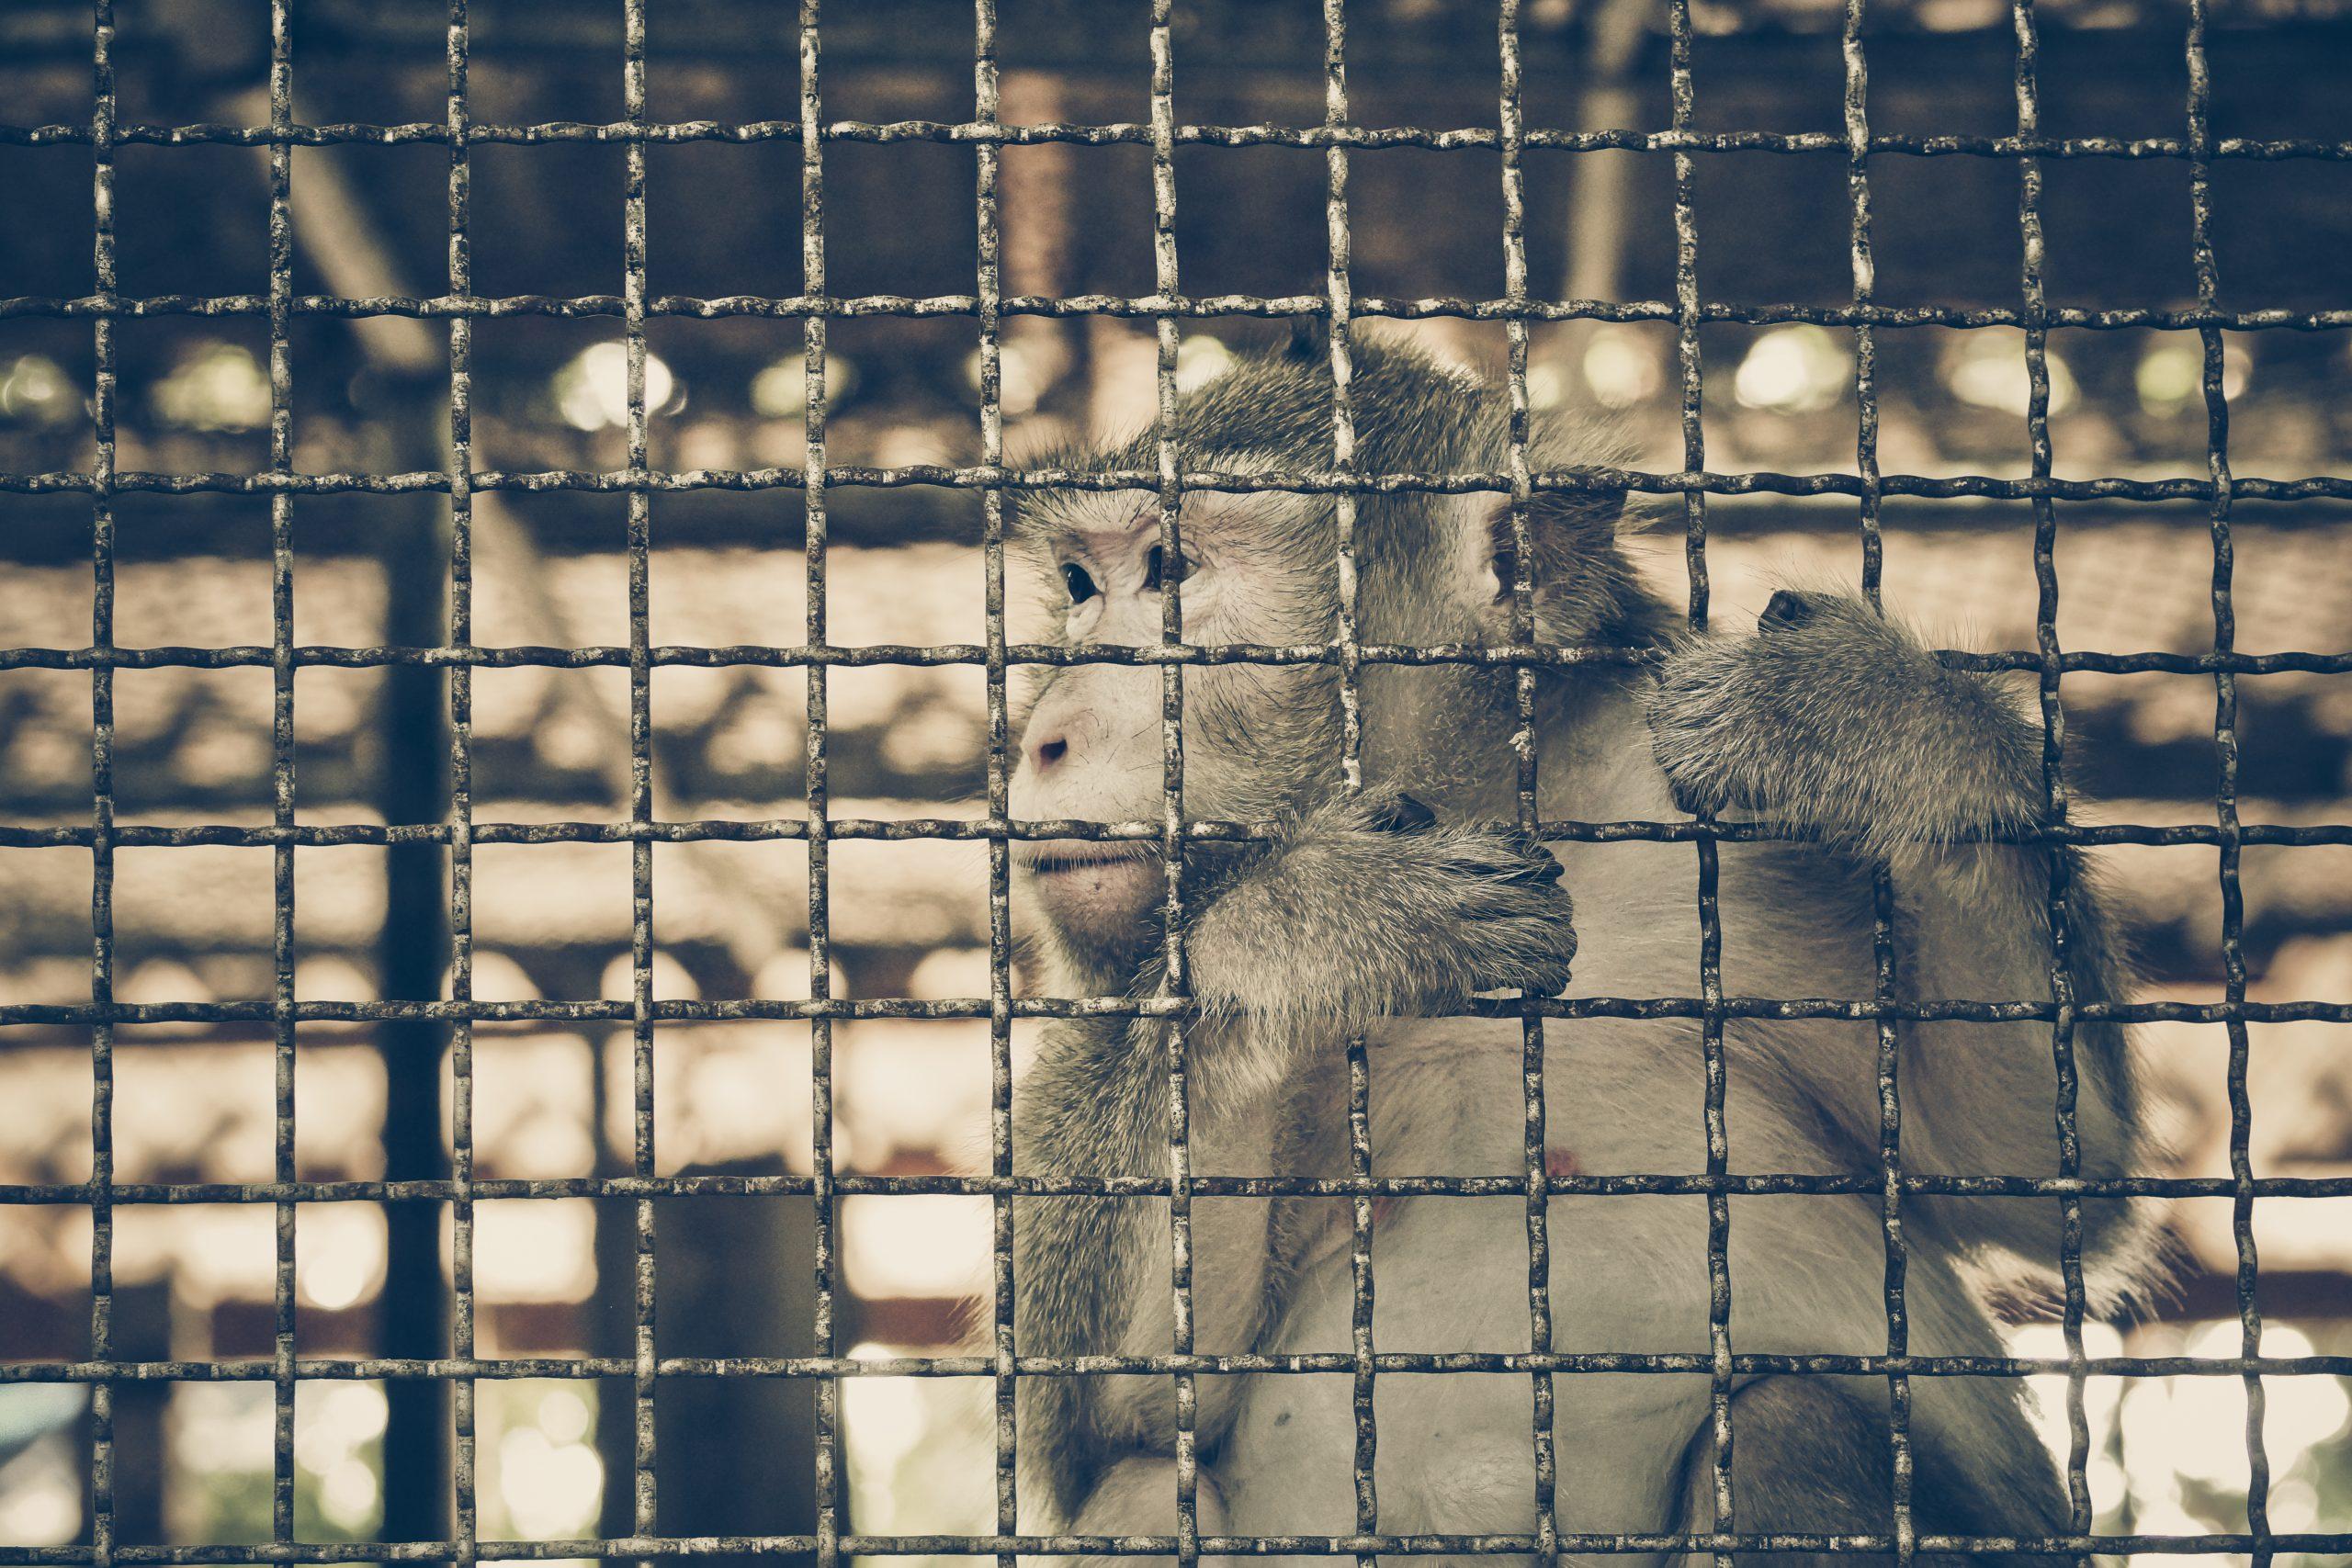 Petition: Beijing Bans Consumption of Wild Animals Due to Coronavirus